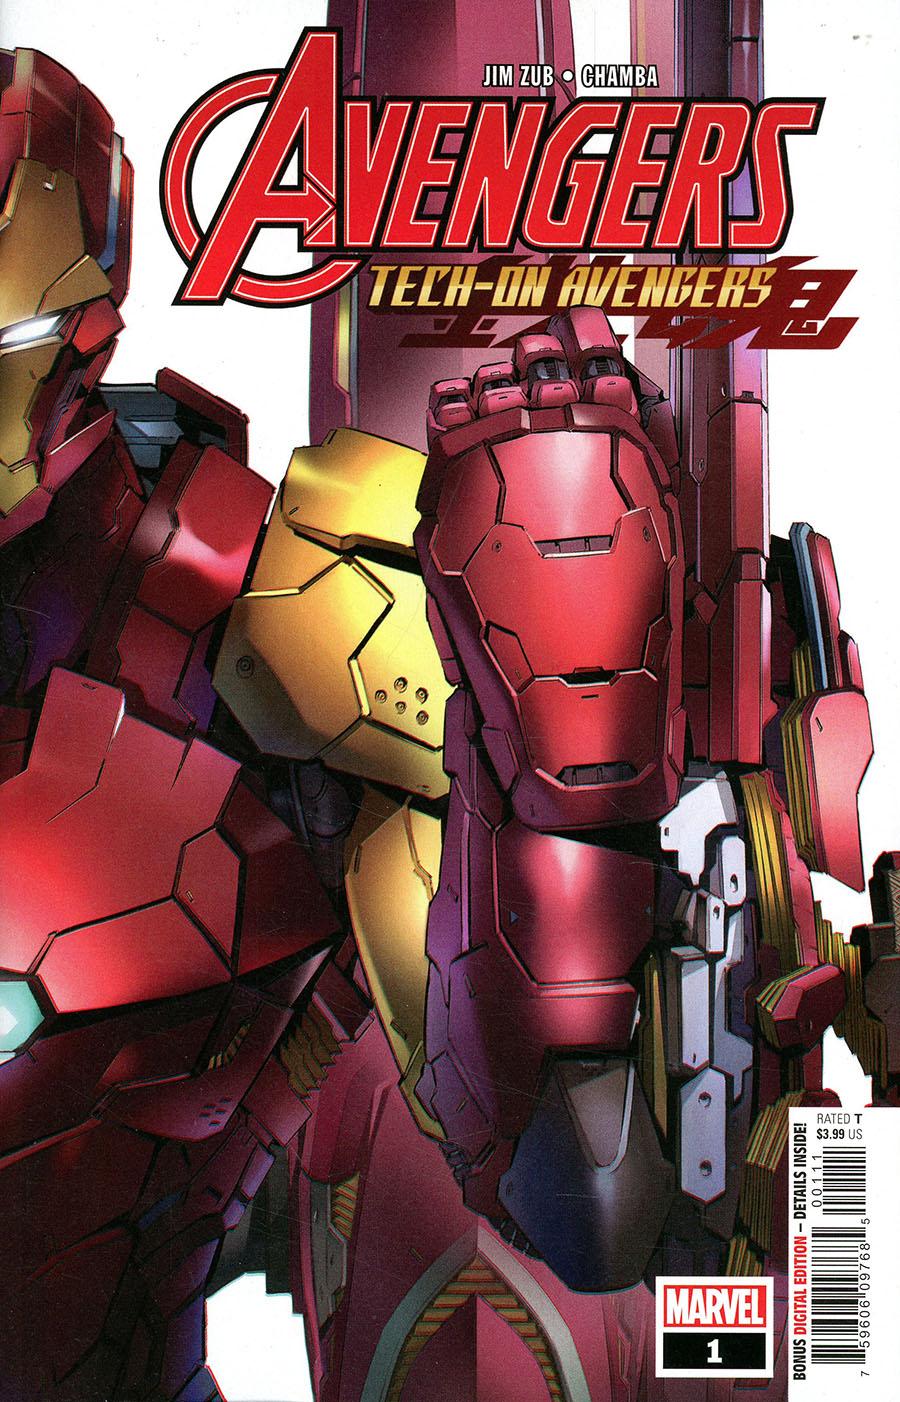 Avengers Tech-On Avengers #1 Cover A Regular Eiichi Shimizu Cover